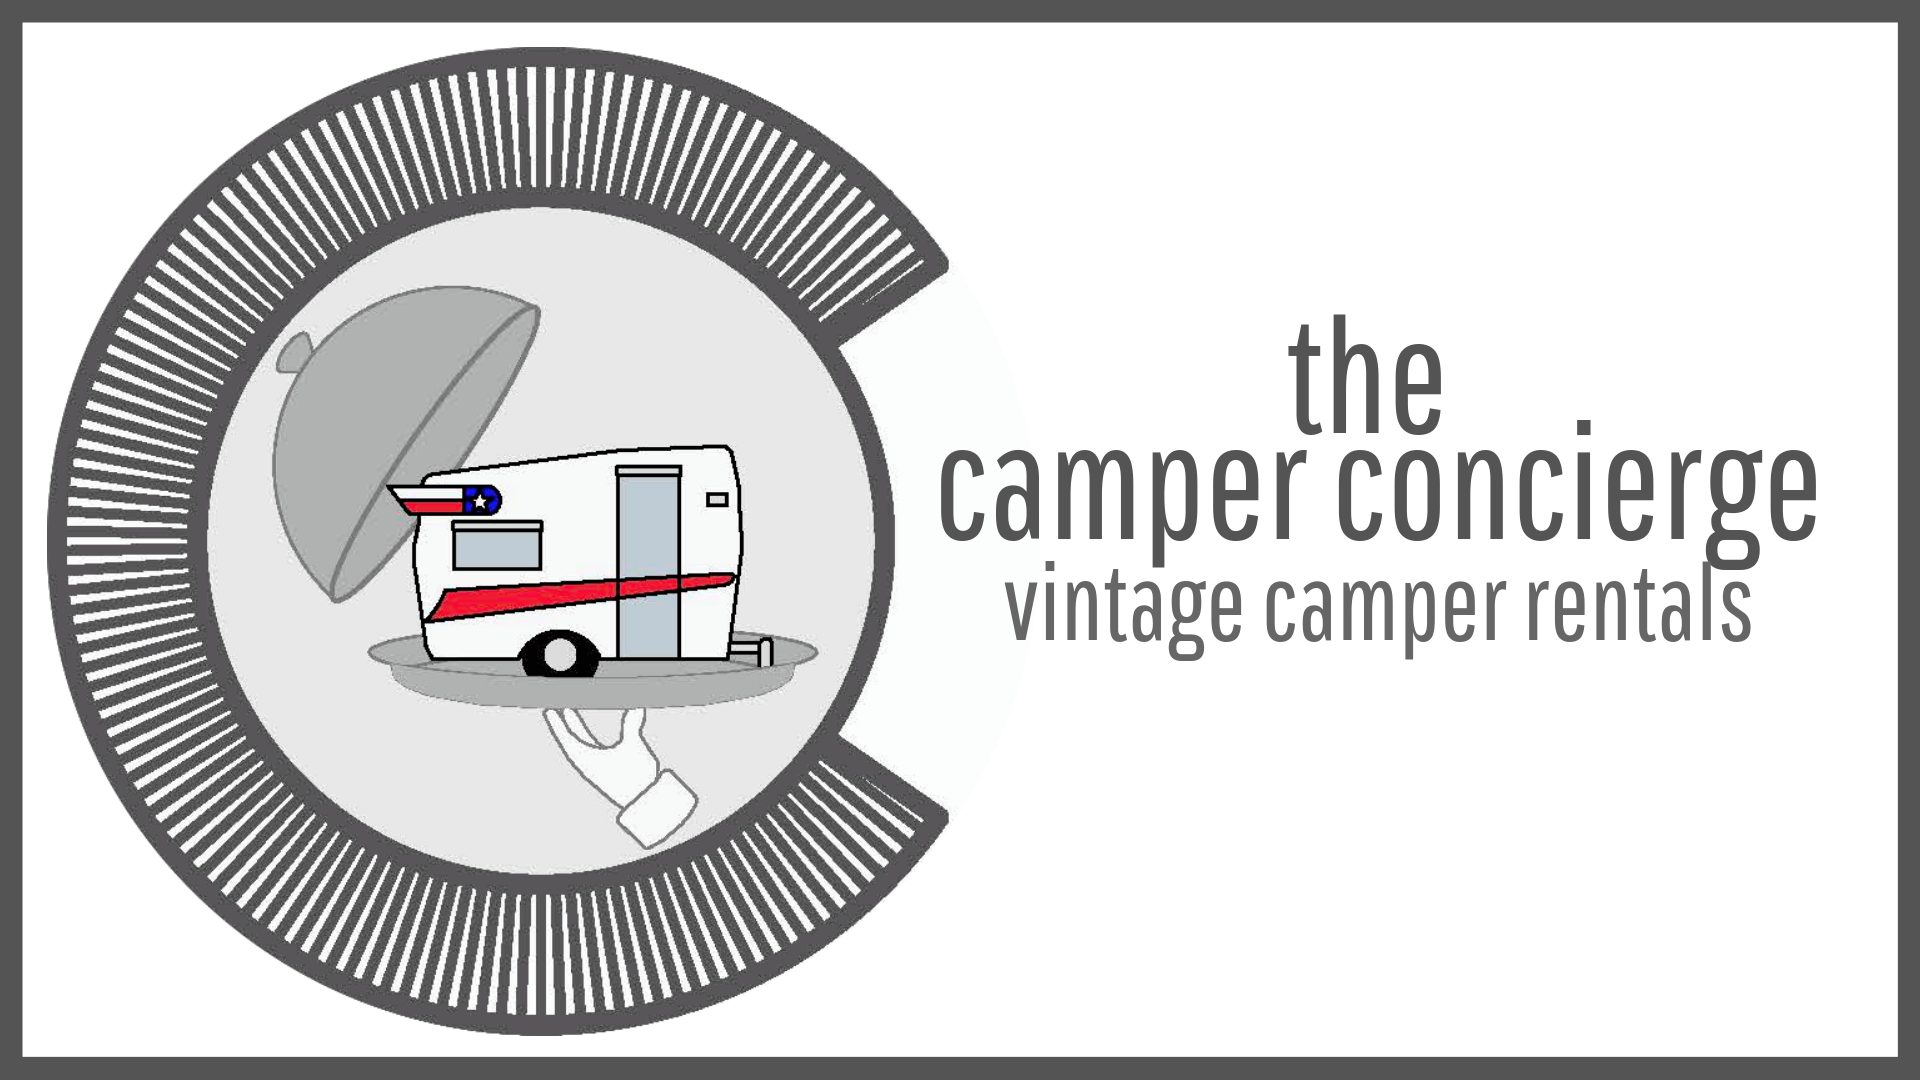 the camper concierge logo.png